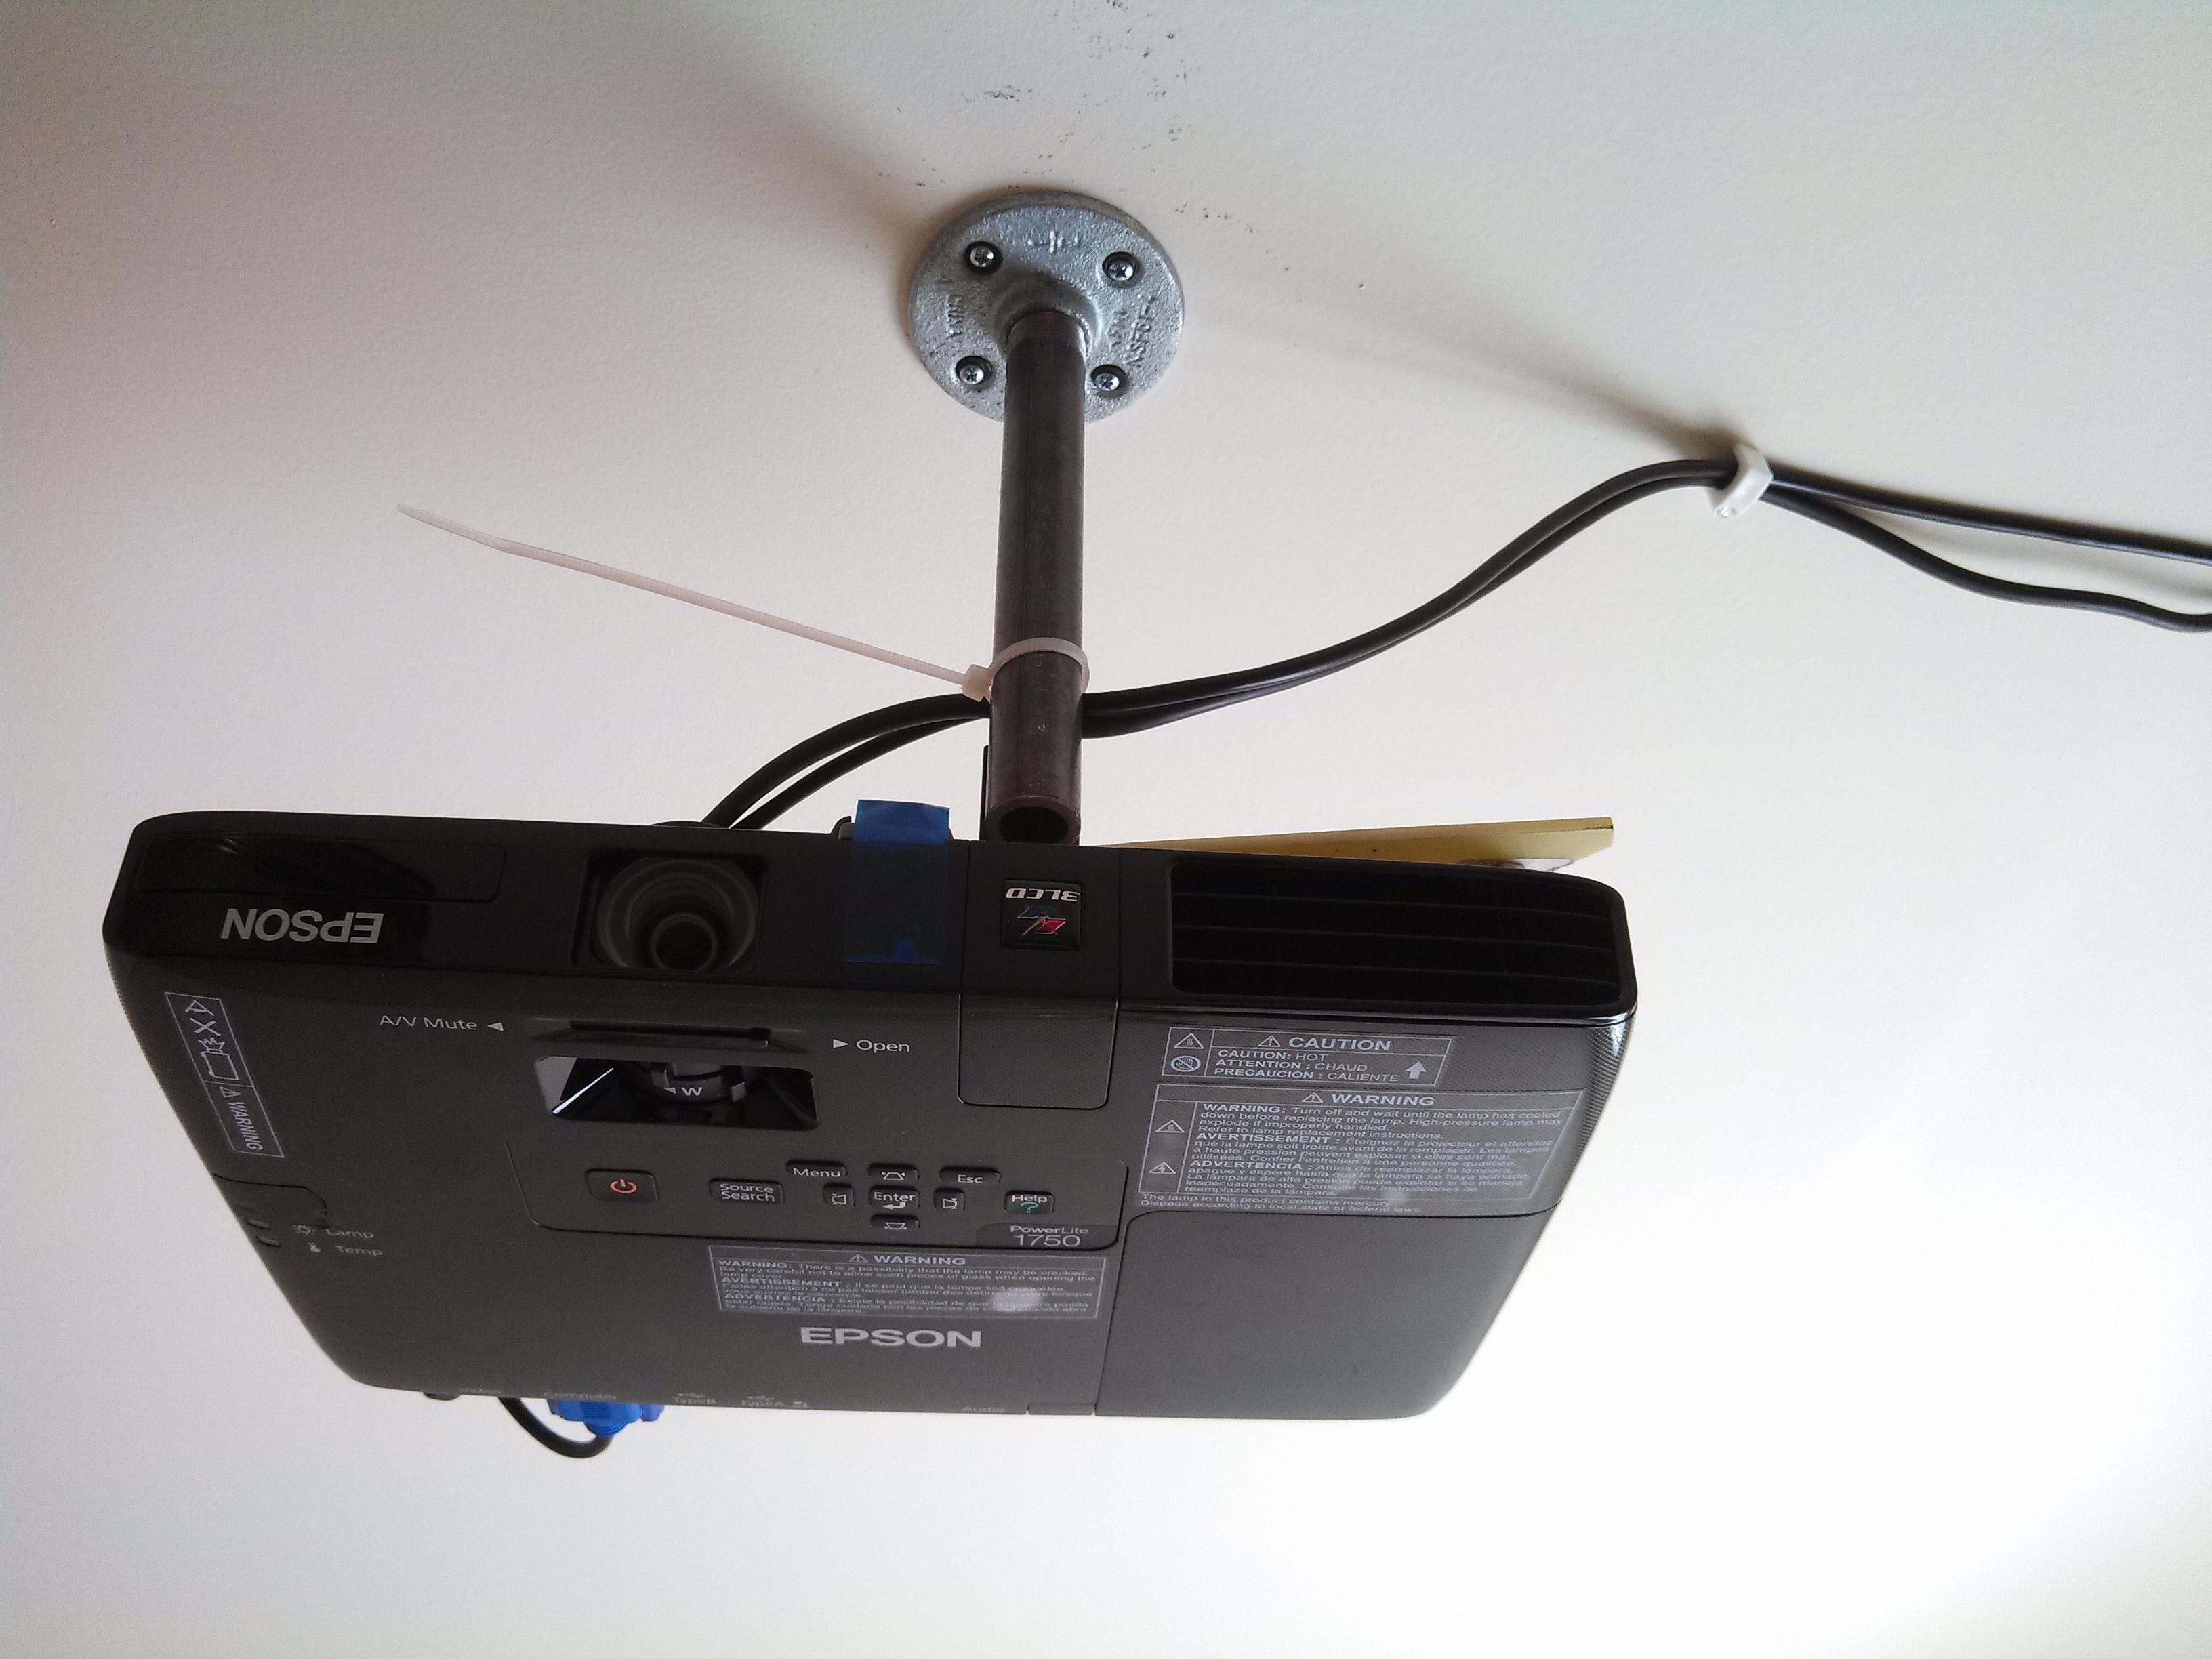 DIY Low Cost Porjector Ceiling Mount